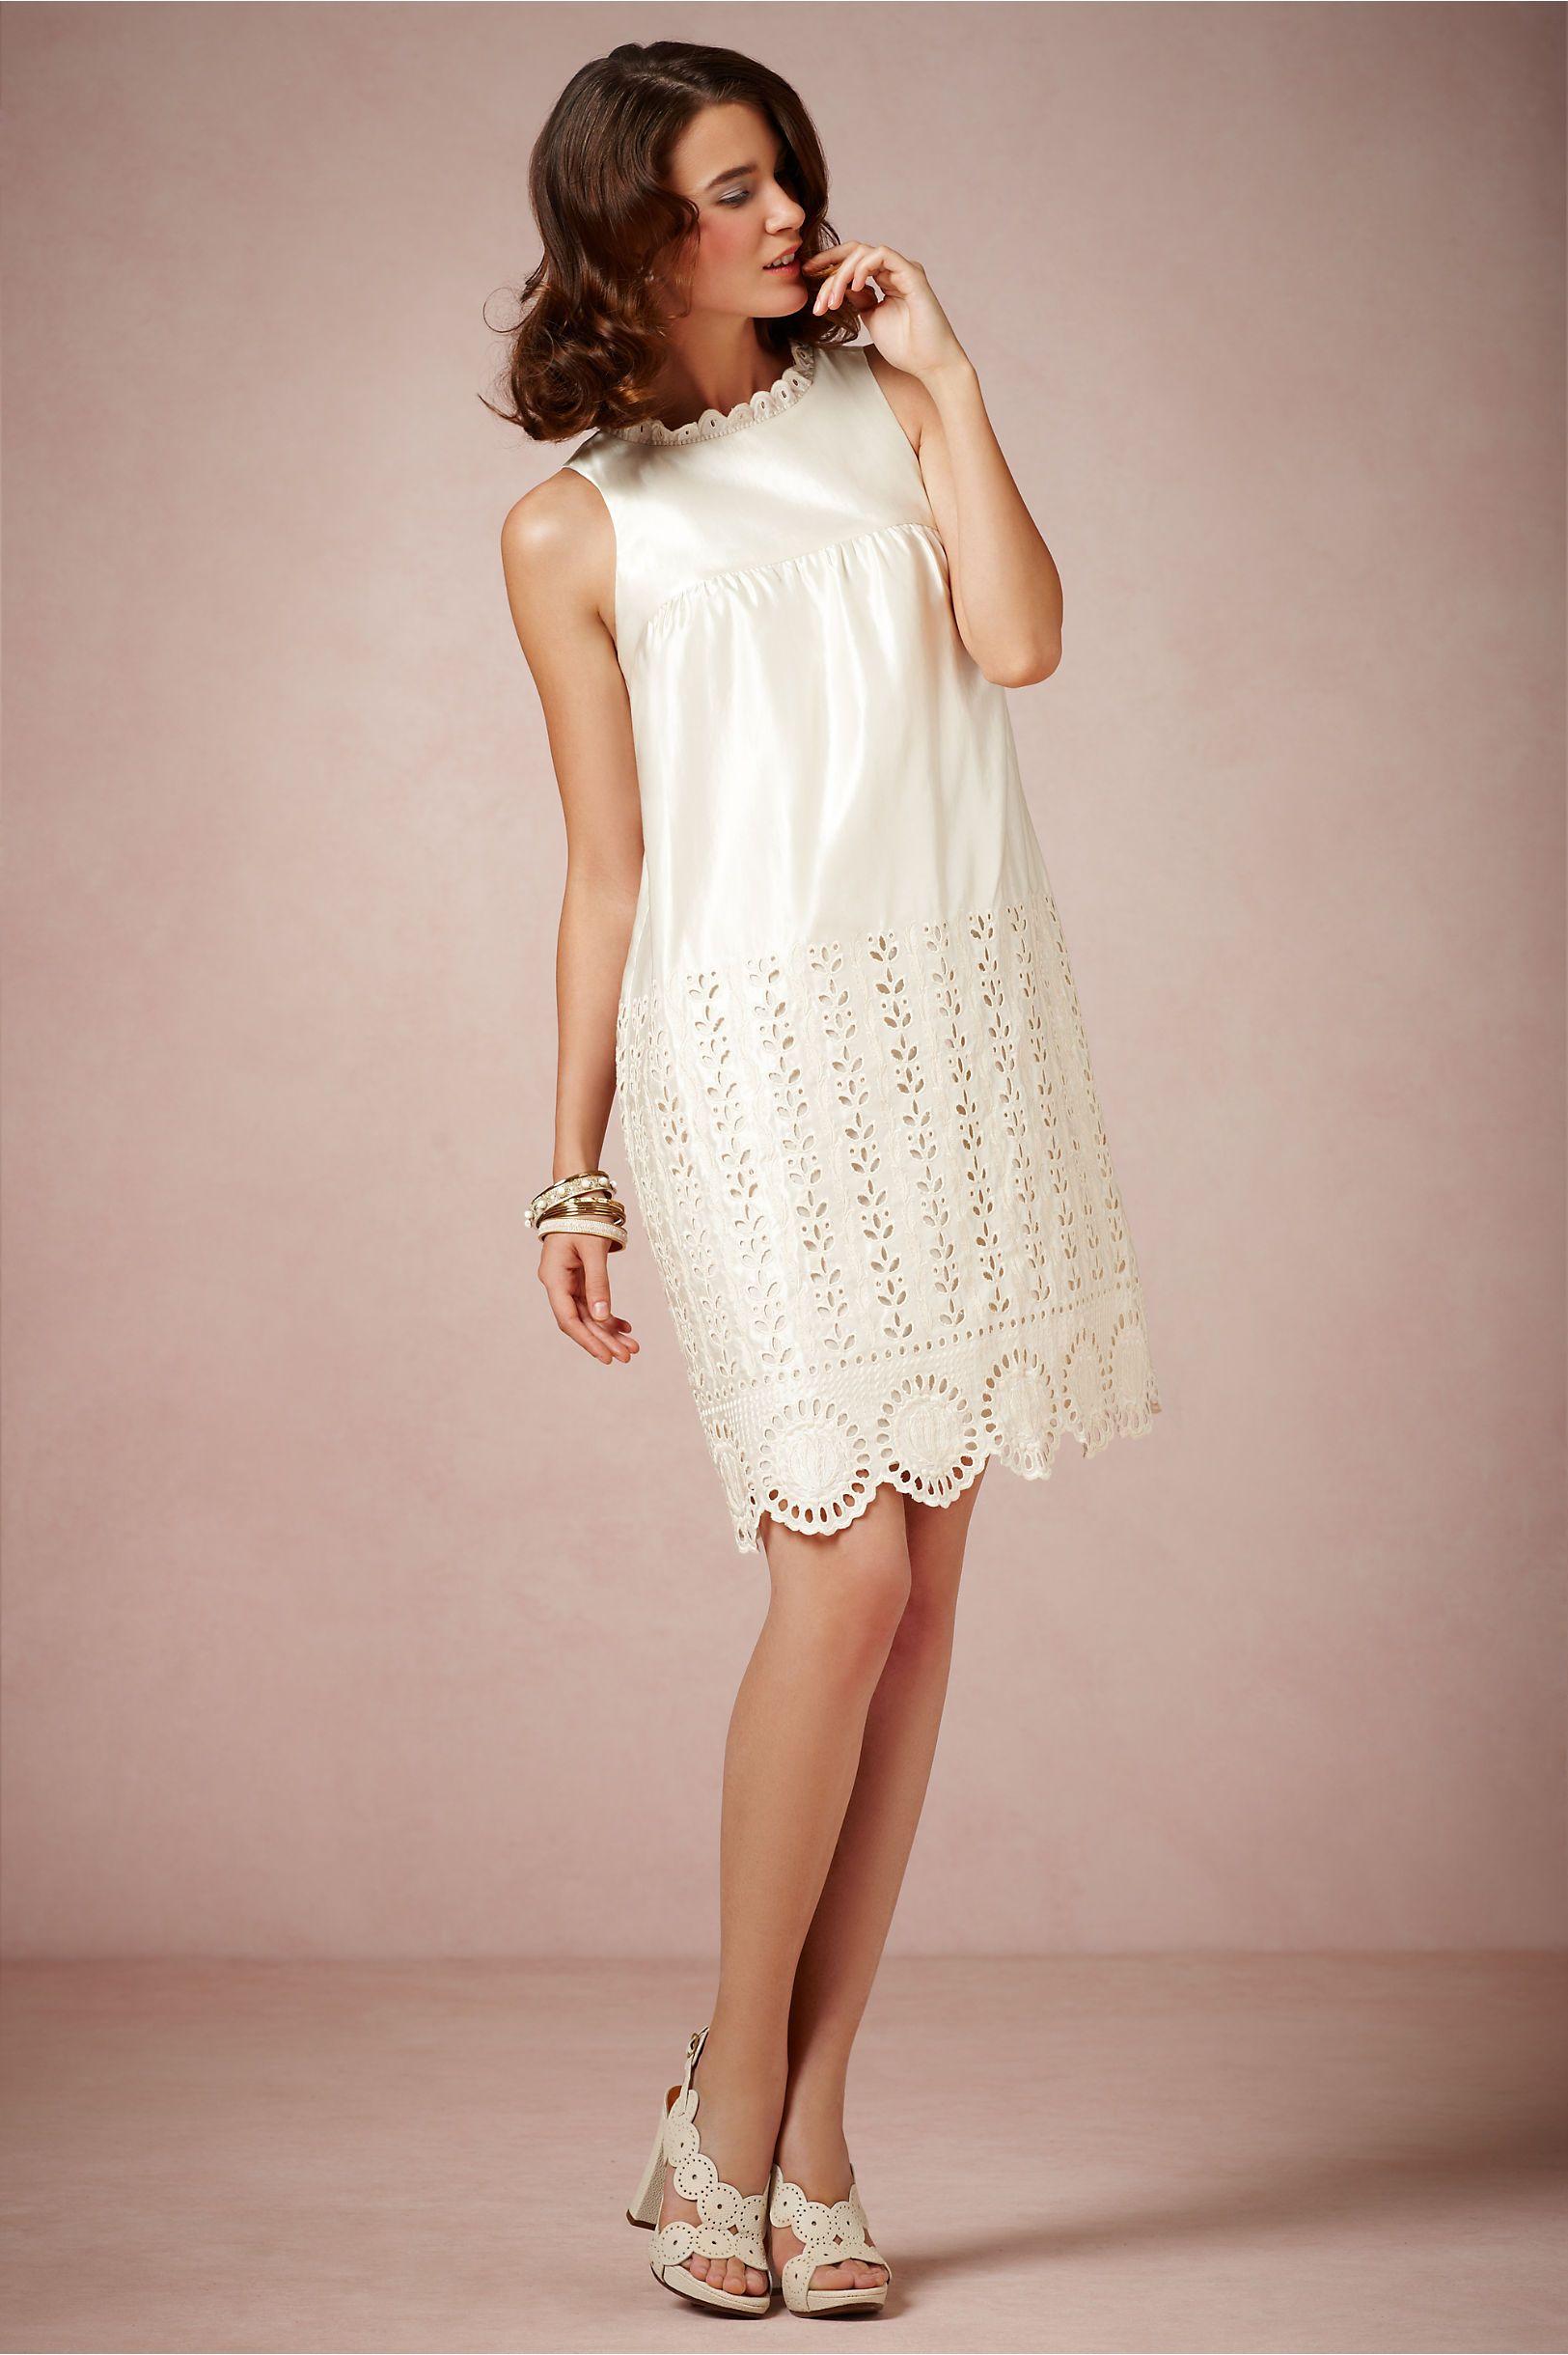 Climbing Ivy Mini in Sale Dresses at BHLDN | BM | Pinterest ...